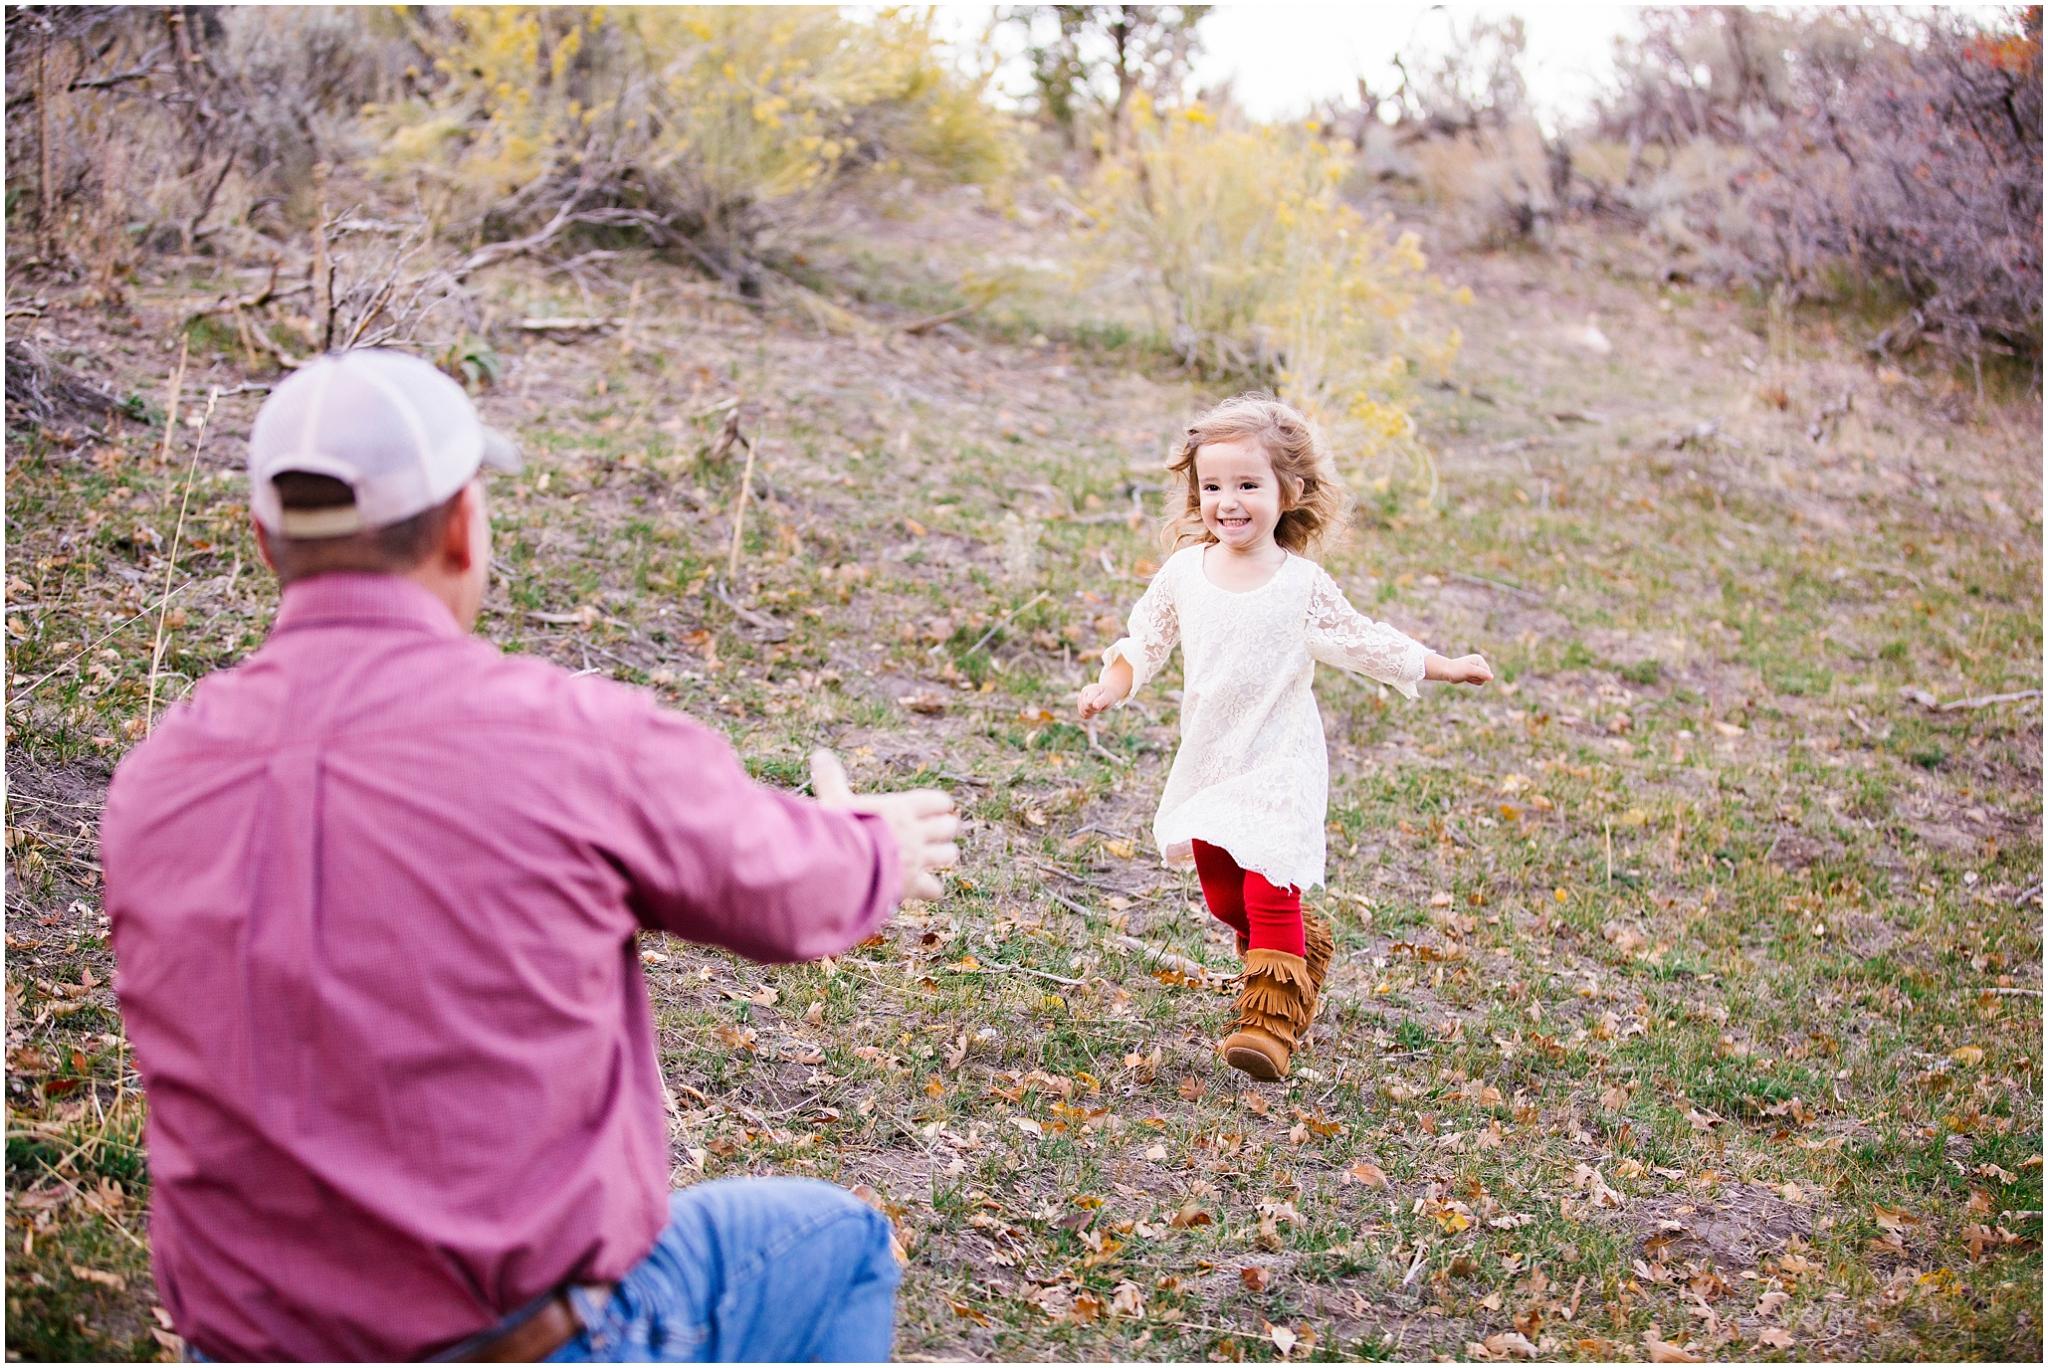 Young--36WEB_Lizzie-B-Imagery-Utah-Family-Photographer-Salt-Lake-City-Utah-County-Park-City.jpg